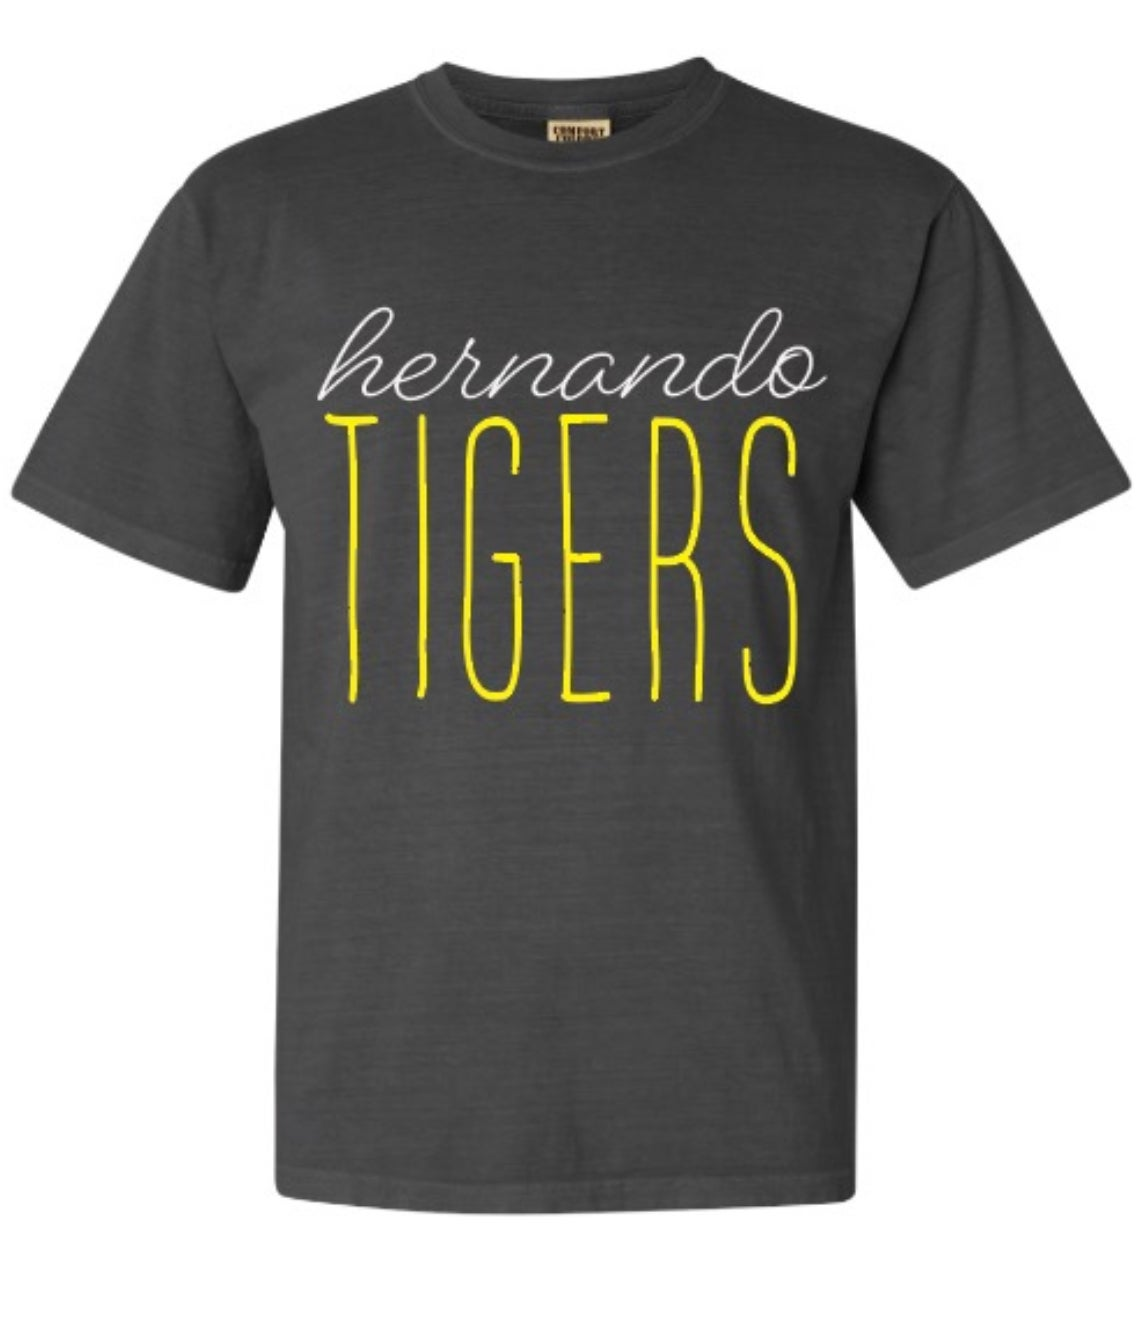 Image of Hernando Tigers - Script Tee #HMD